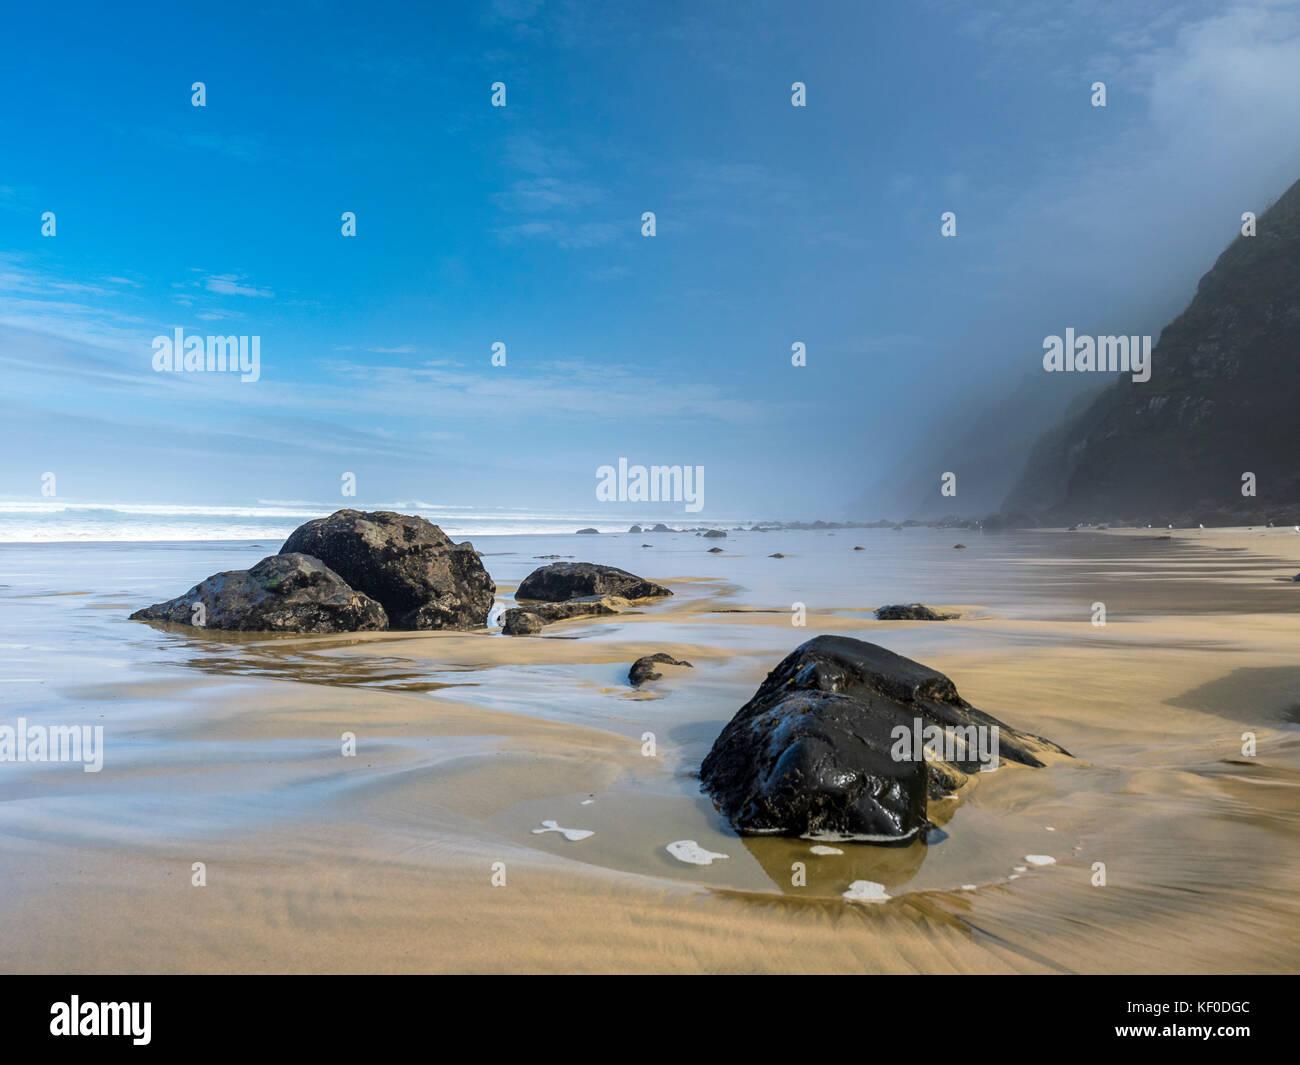 New Zealand, North Island, view to Maunganui Bluff Beach - Stock Image